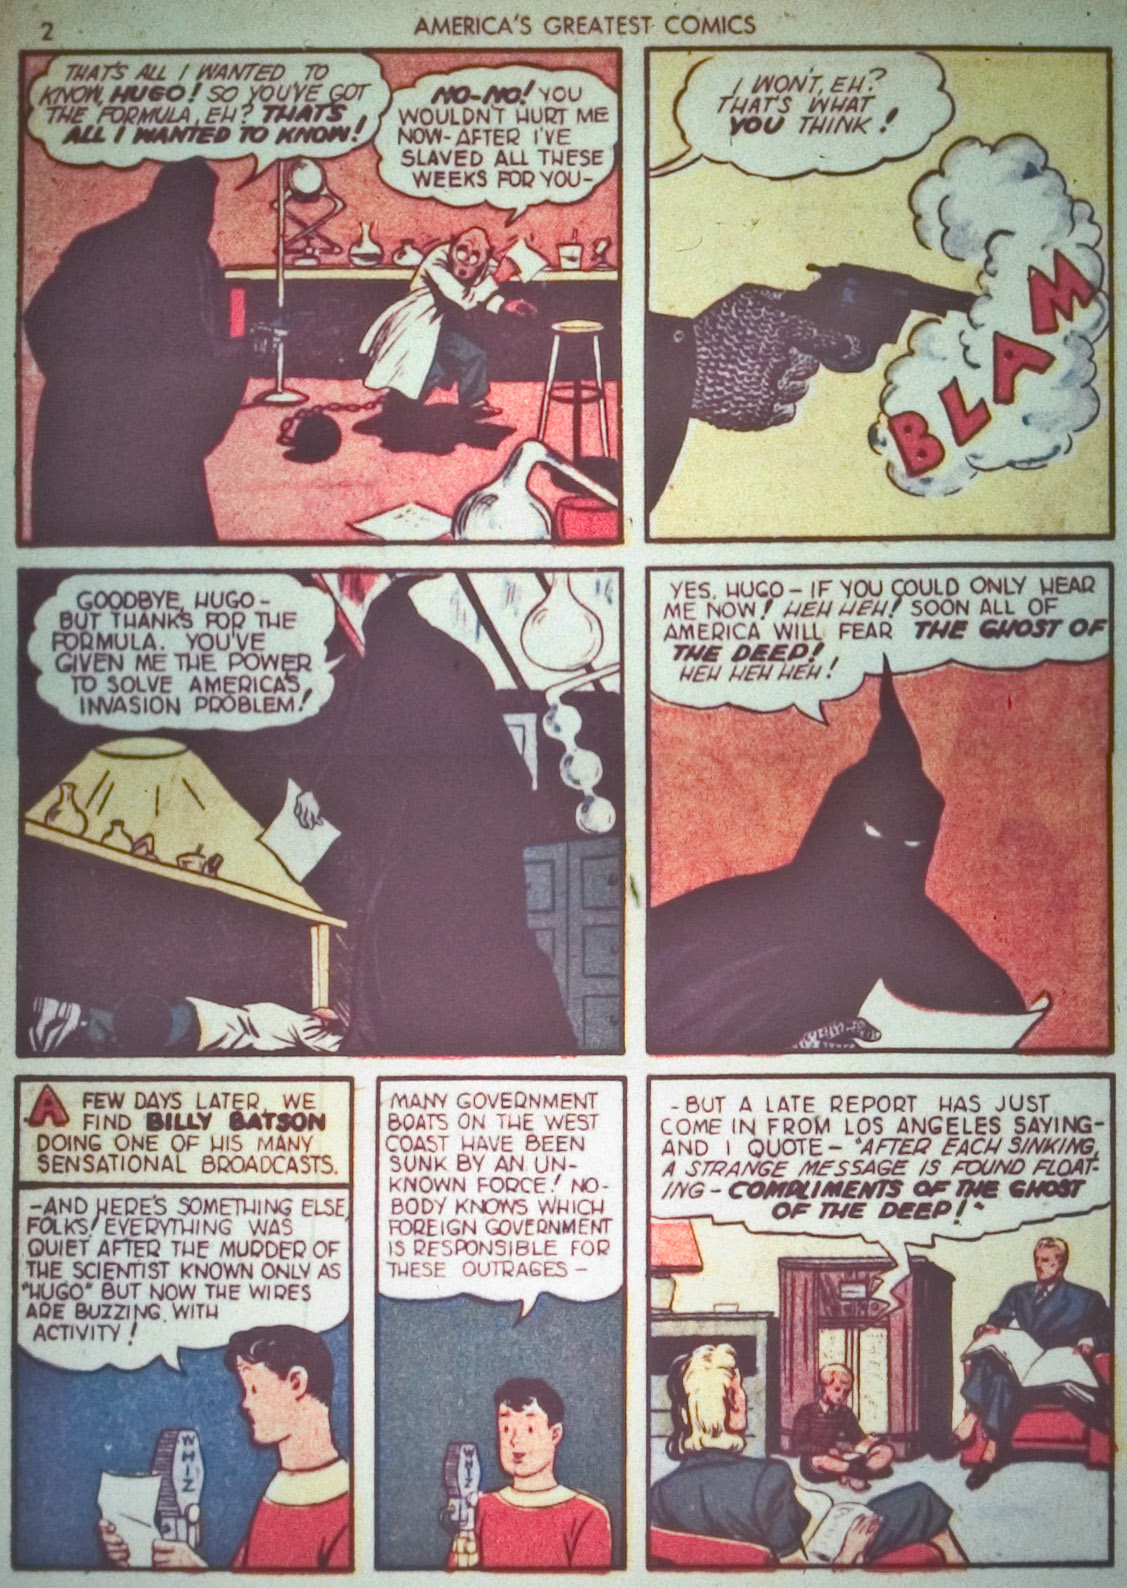 Read online America's Greatest Comics comic -  Issue #1 - 5